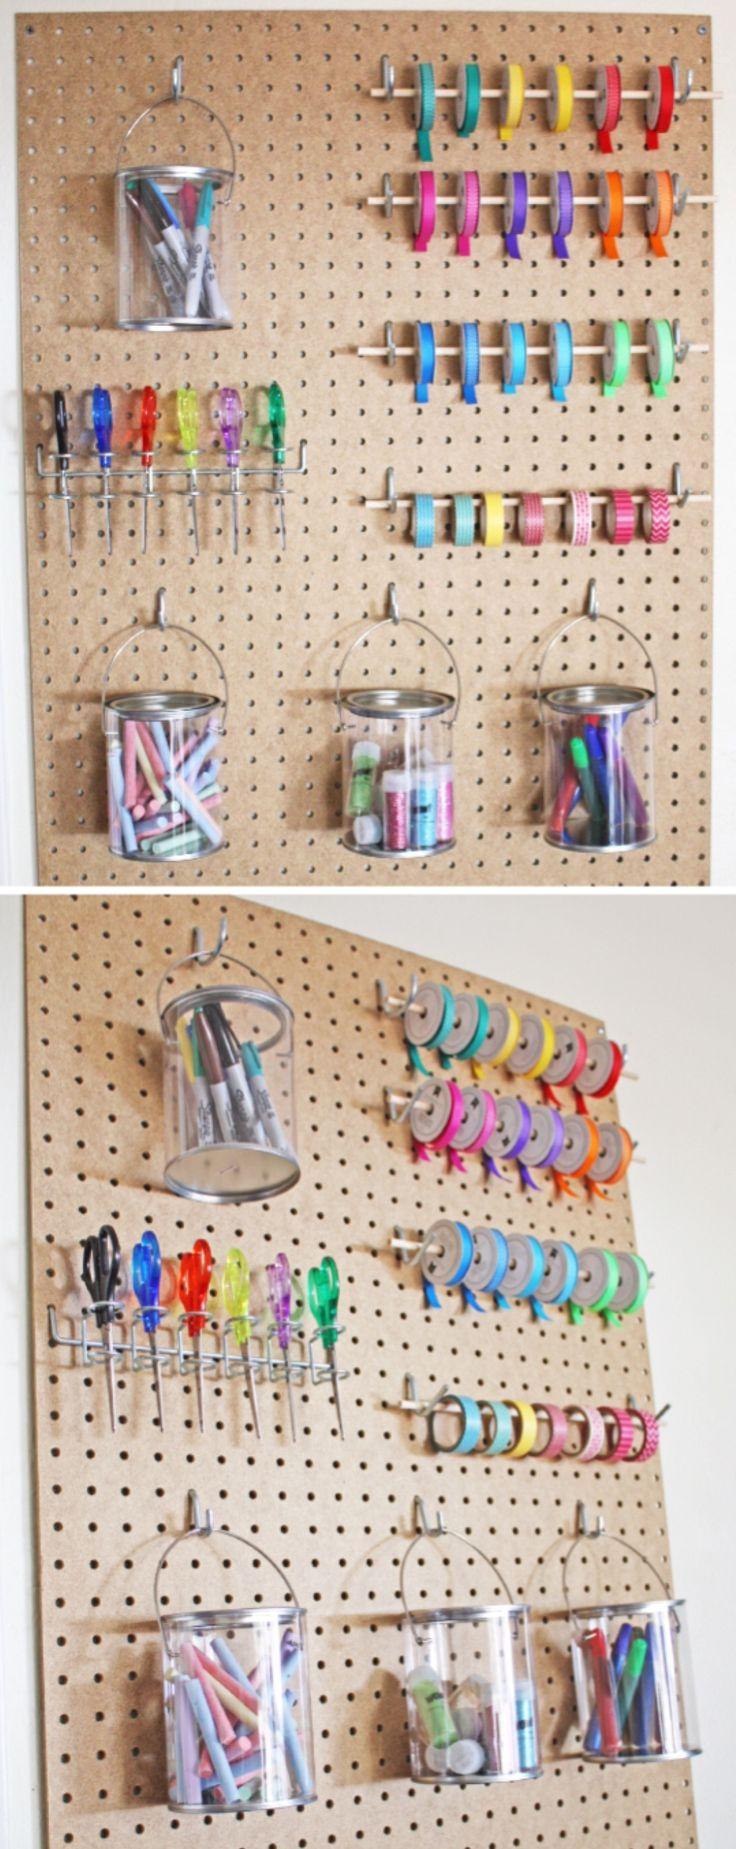 Craft room organization ideas - Pegboard Craft Room Storage Idea